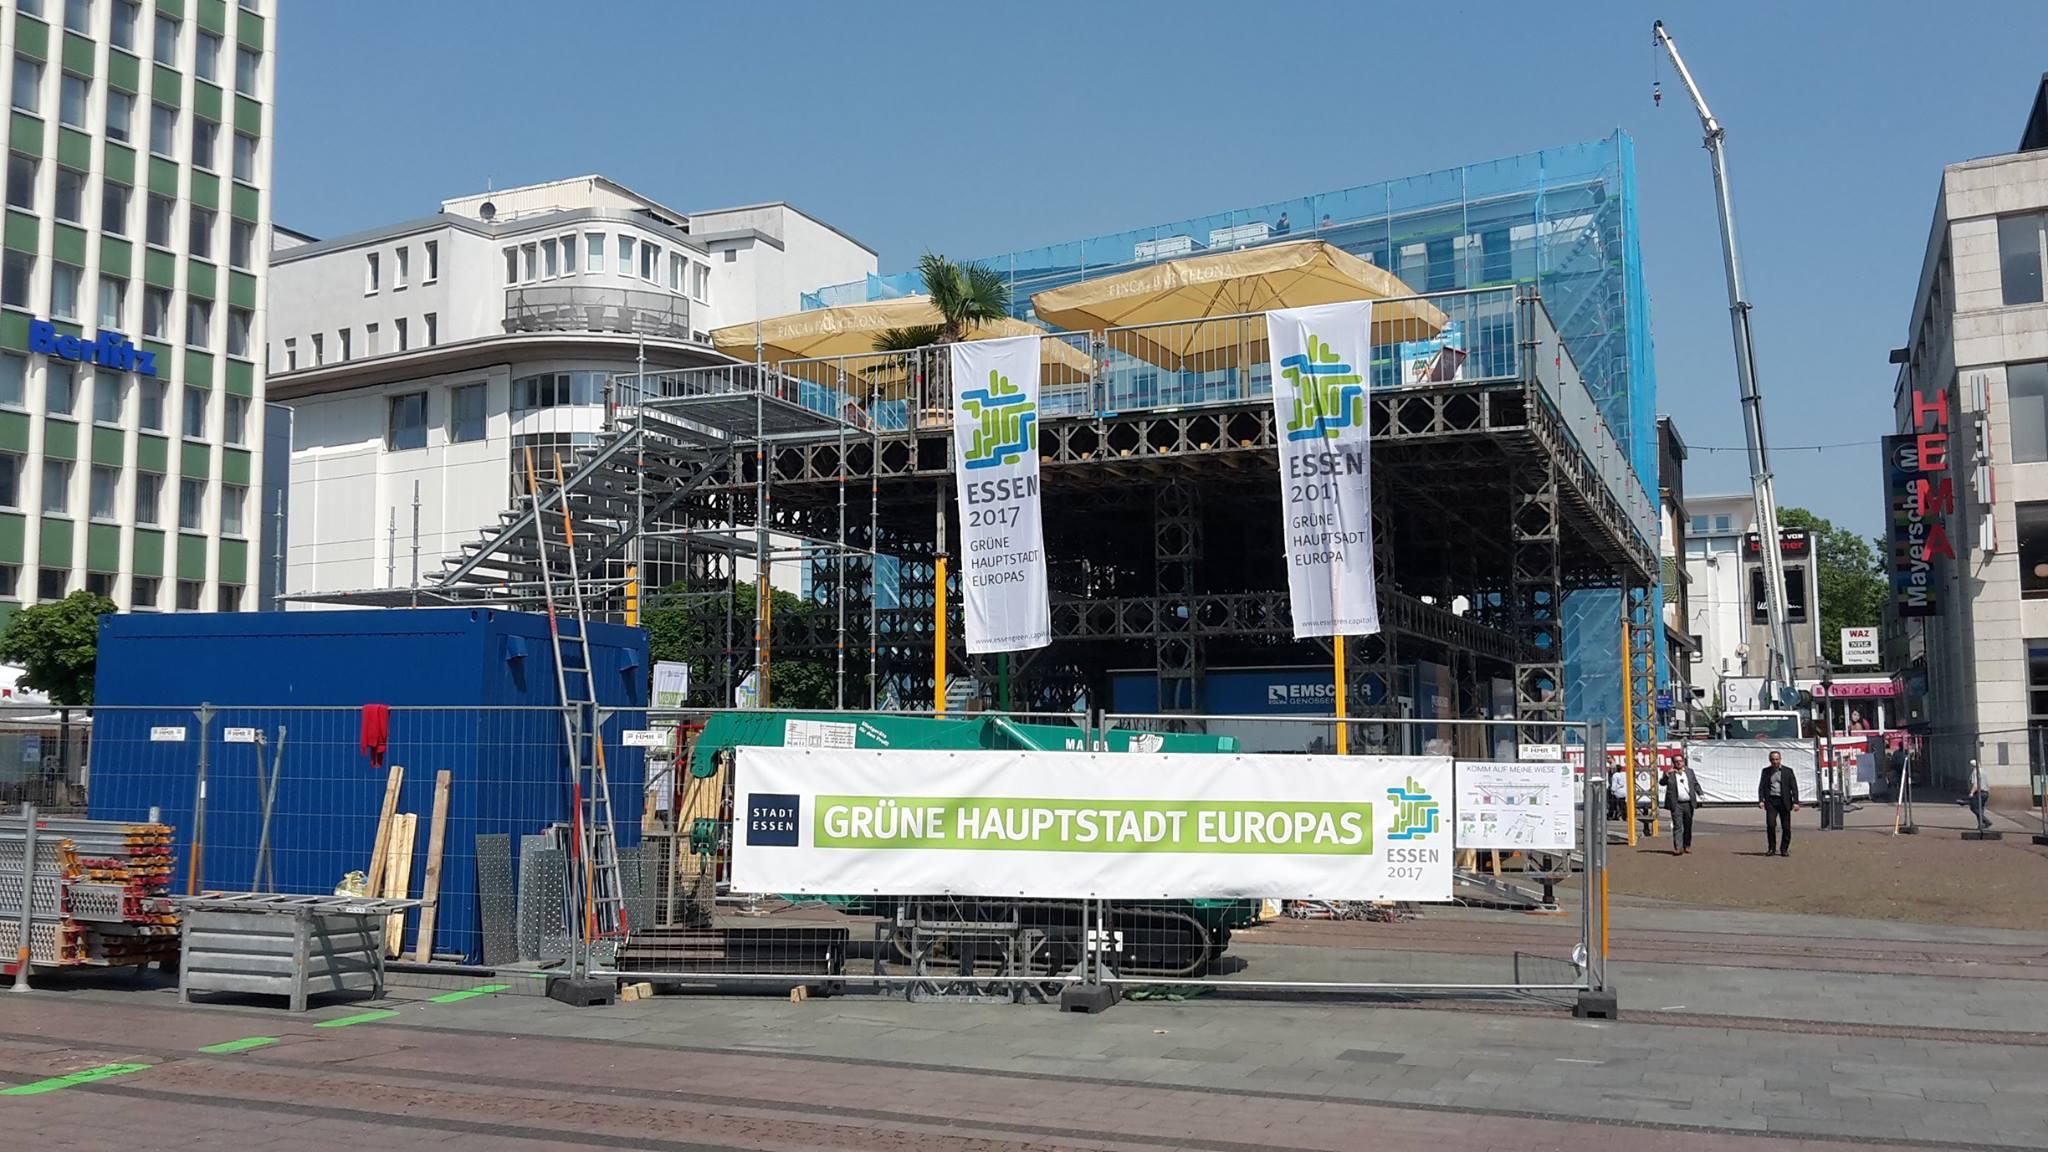 Grüne Hauptstadt Europas - Essen 2017